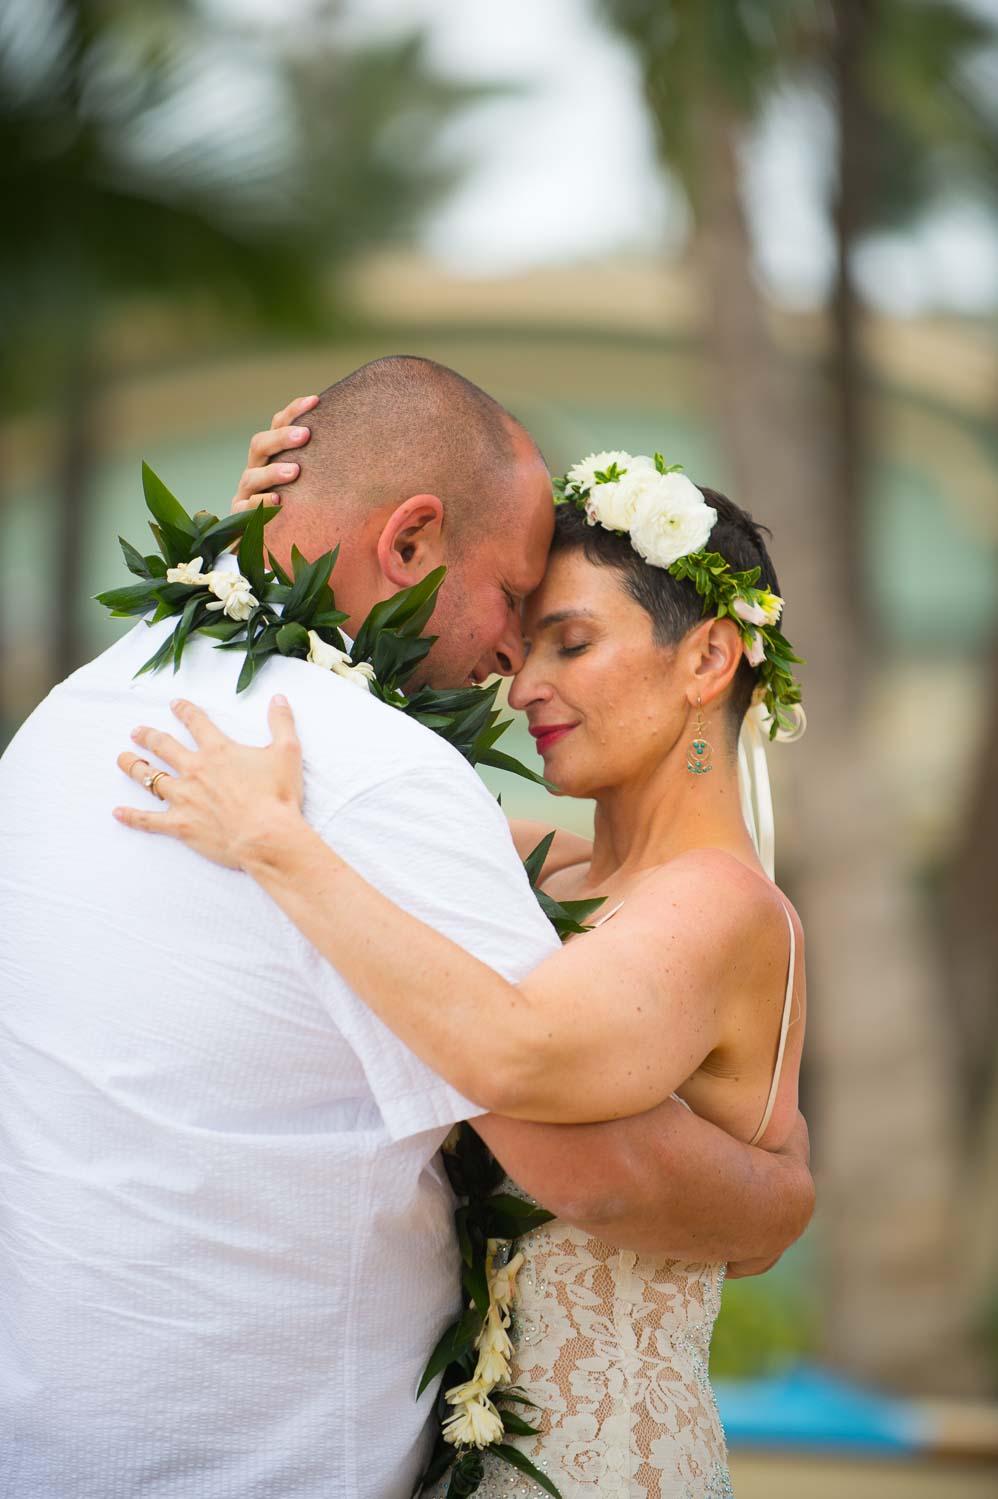 maui-wedding-photography-maui-wedding-venue-Tad-Craig-Photography-41.jpg